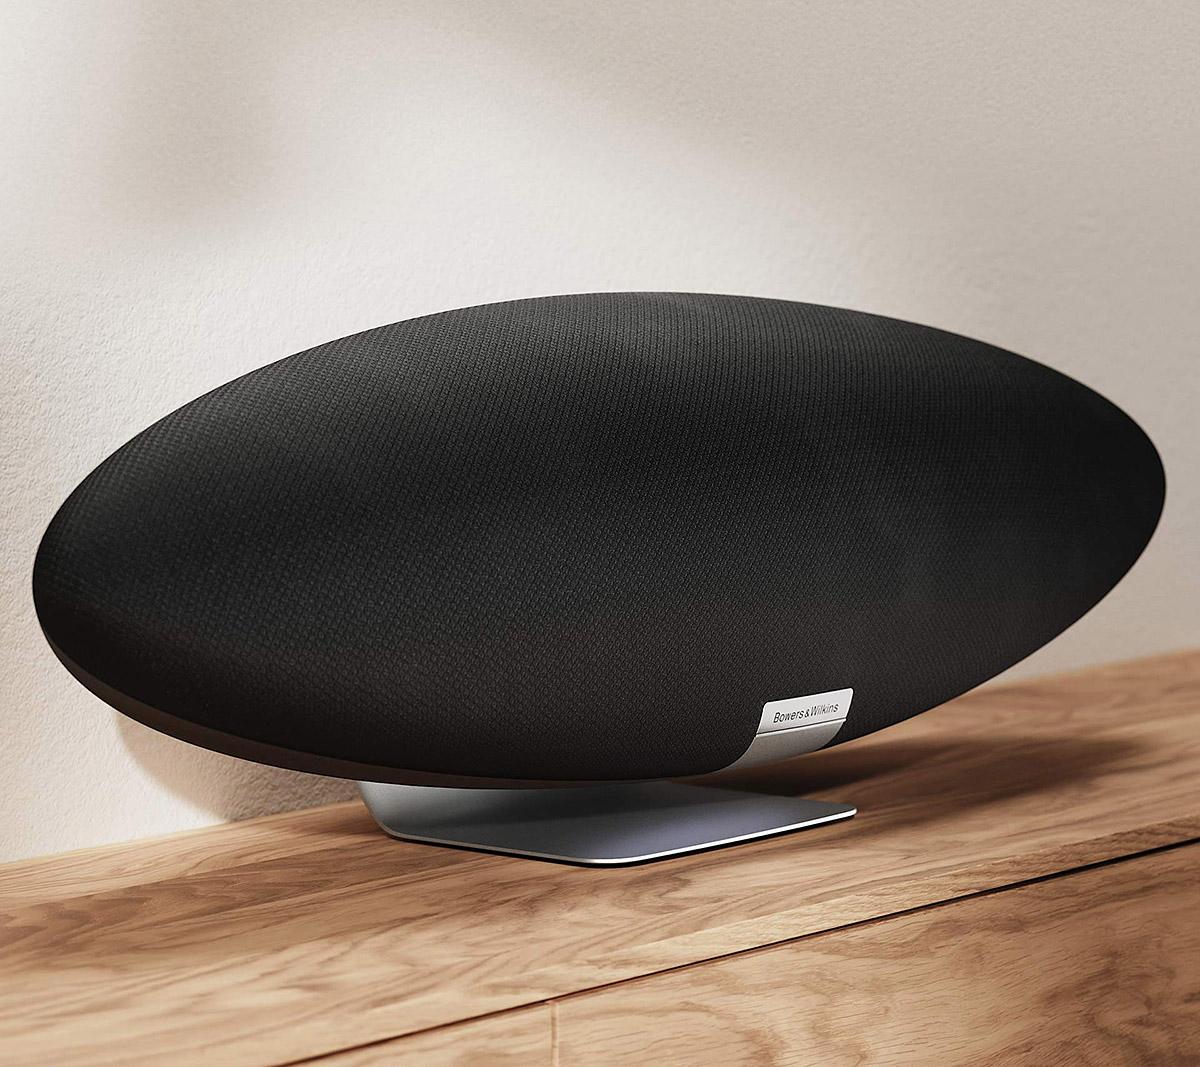 Bowers & Wilkins Zeppelin Gets a Fresh Wireless Update at werd.com